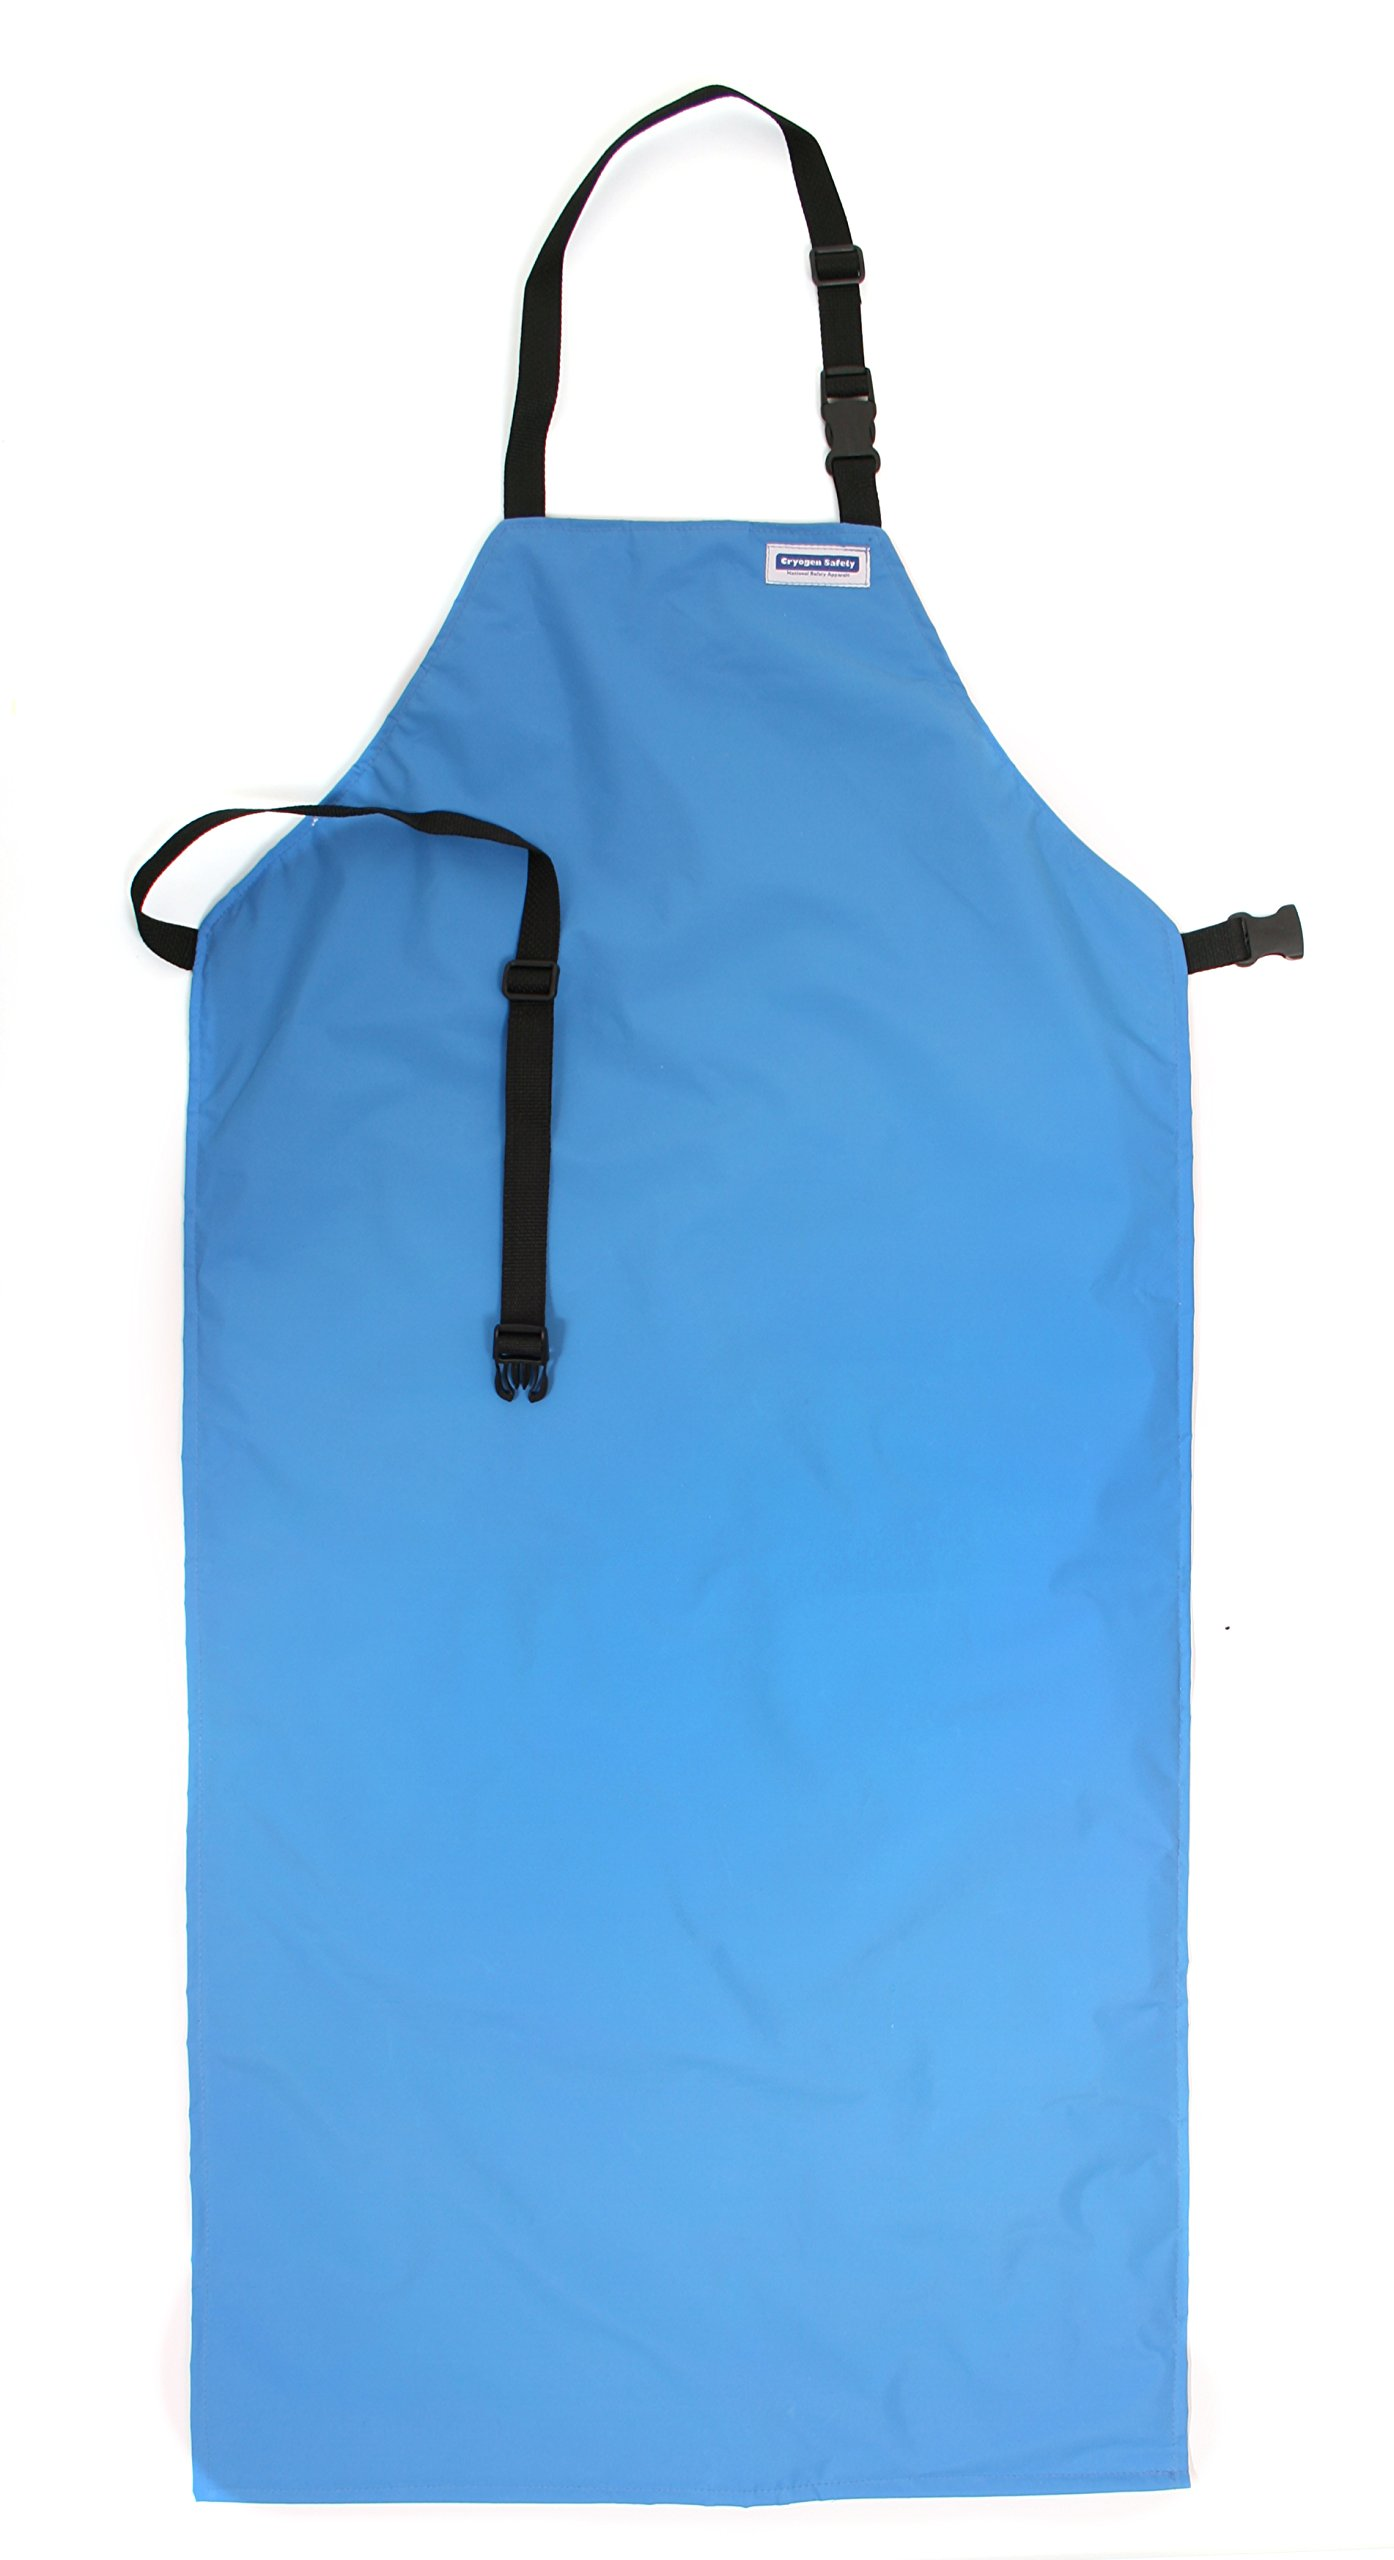 National Safety Apparel A02CRC24X48 Nylon Taslan and PTFE Waterproof Cryogenic Safety Bib Apron, 48'' Length x 24'' Width, Blue by National Safety Apparel Inc